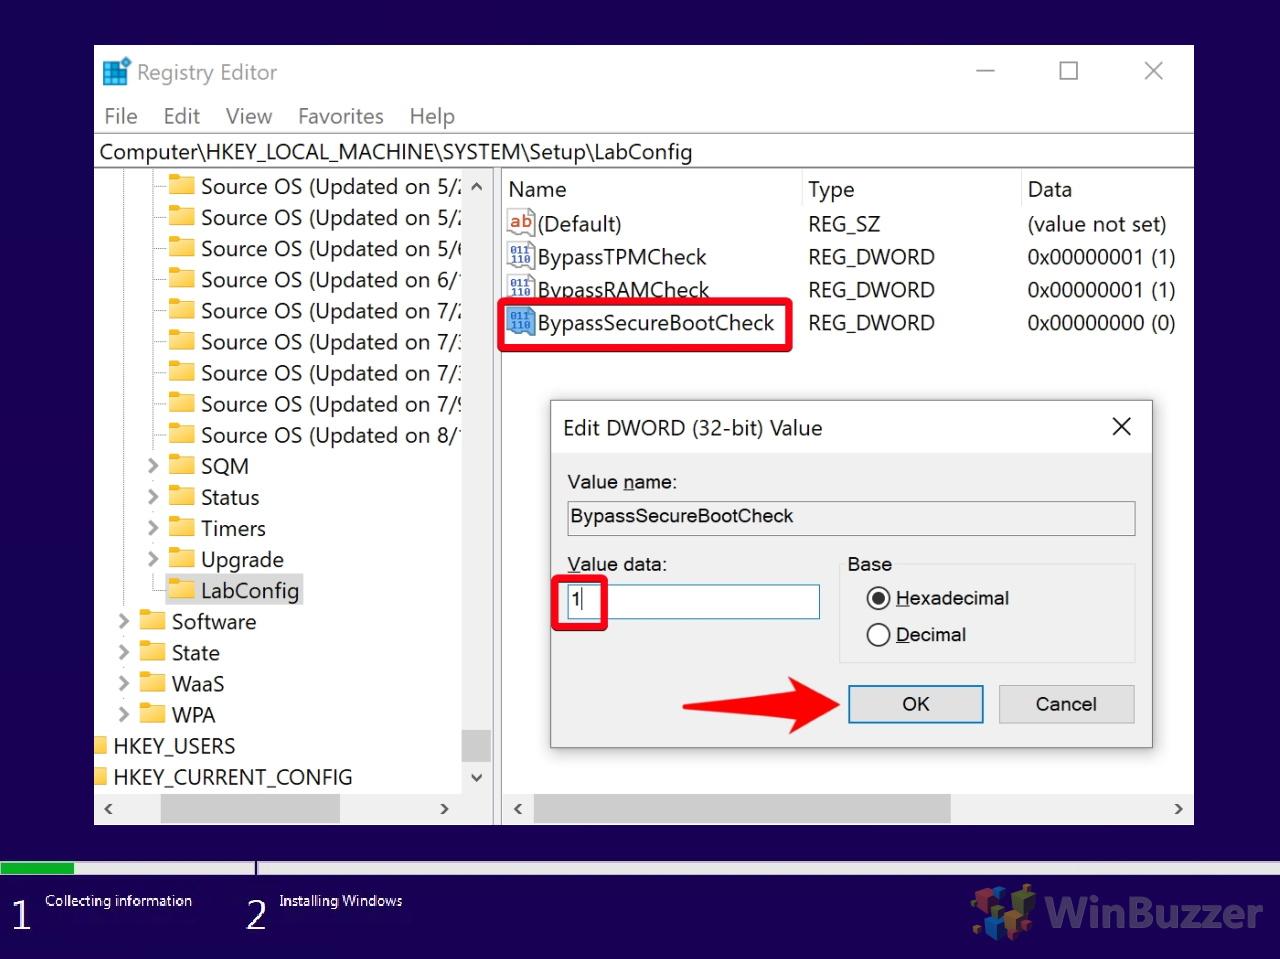 Windows 10 - Windows Setup - Can´t run Windows 10 - Command Prompt - Registry Editor - Navigate to - Setup - LabConfig - New DWORD - BypassSecureBootCheck - 1 Value